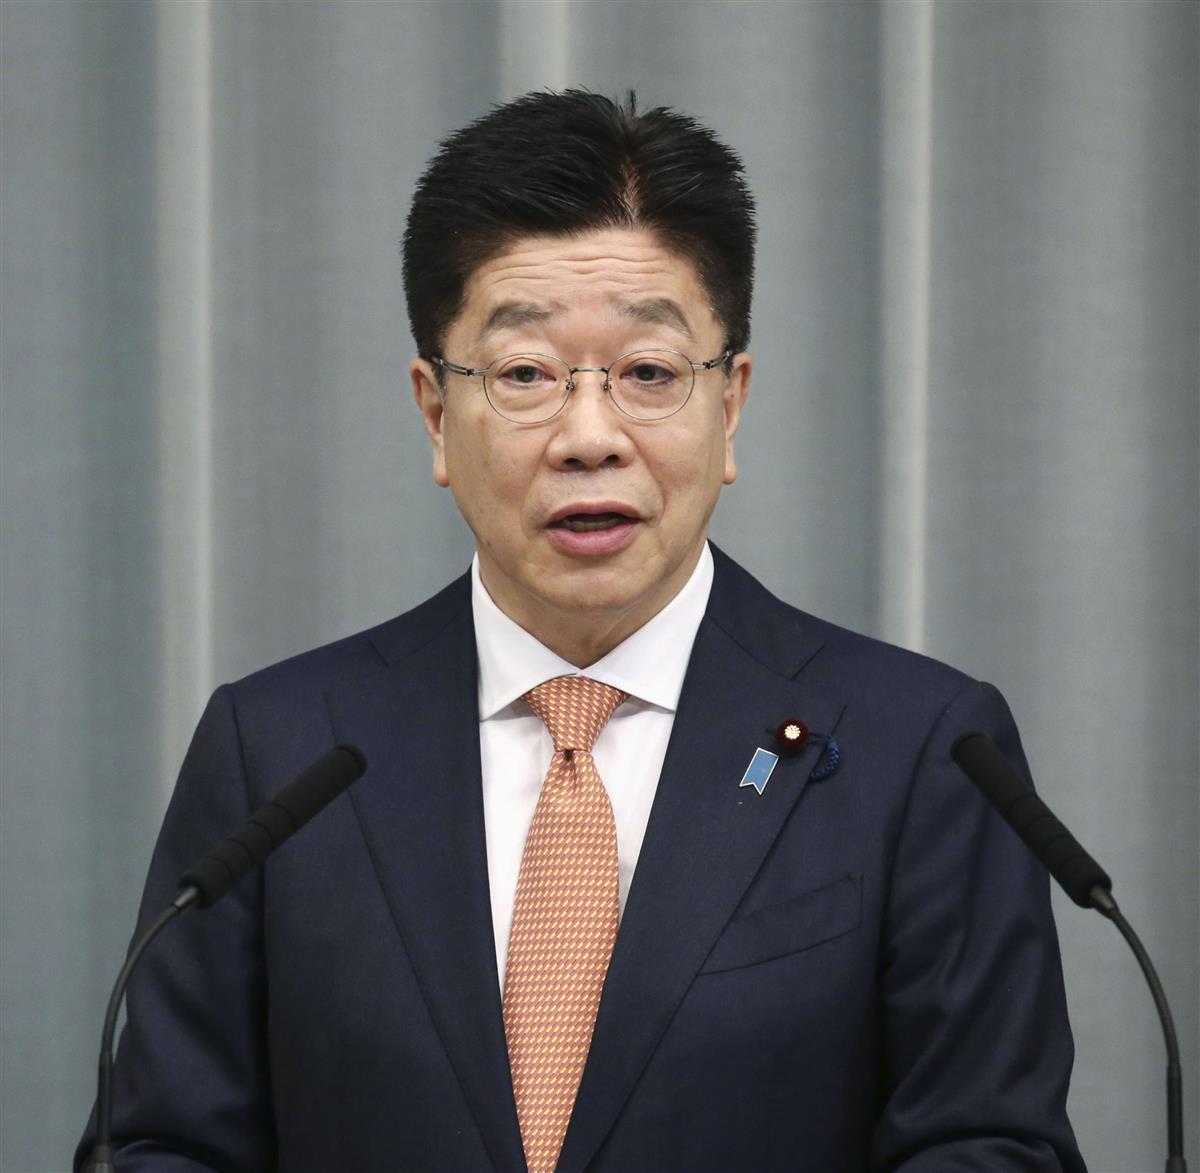 加藤官房長官、高額接待で山田内閣広報官を厳重注意「甚だ遺憾」…